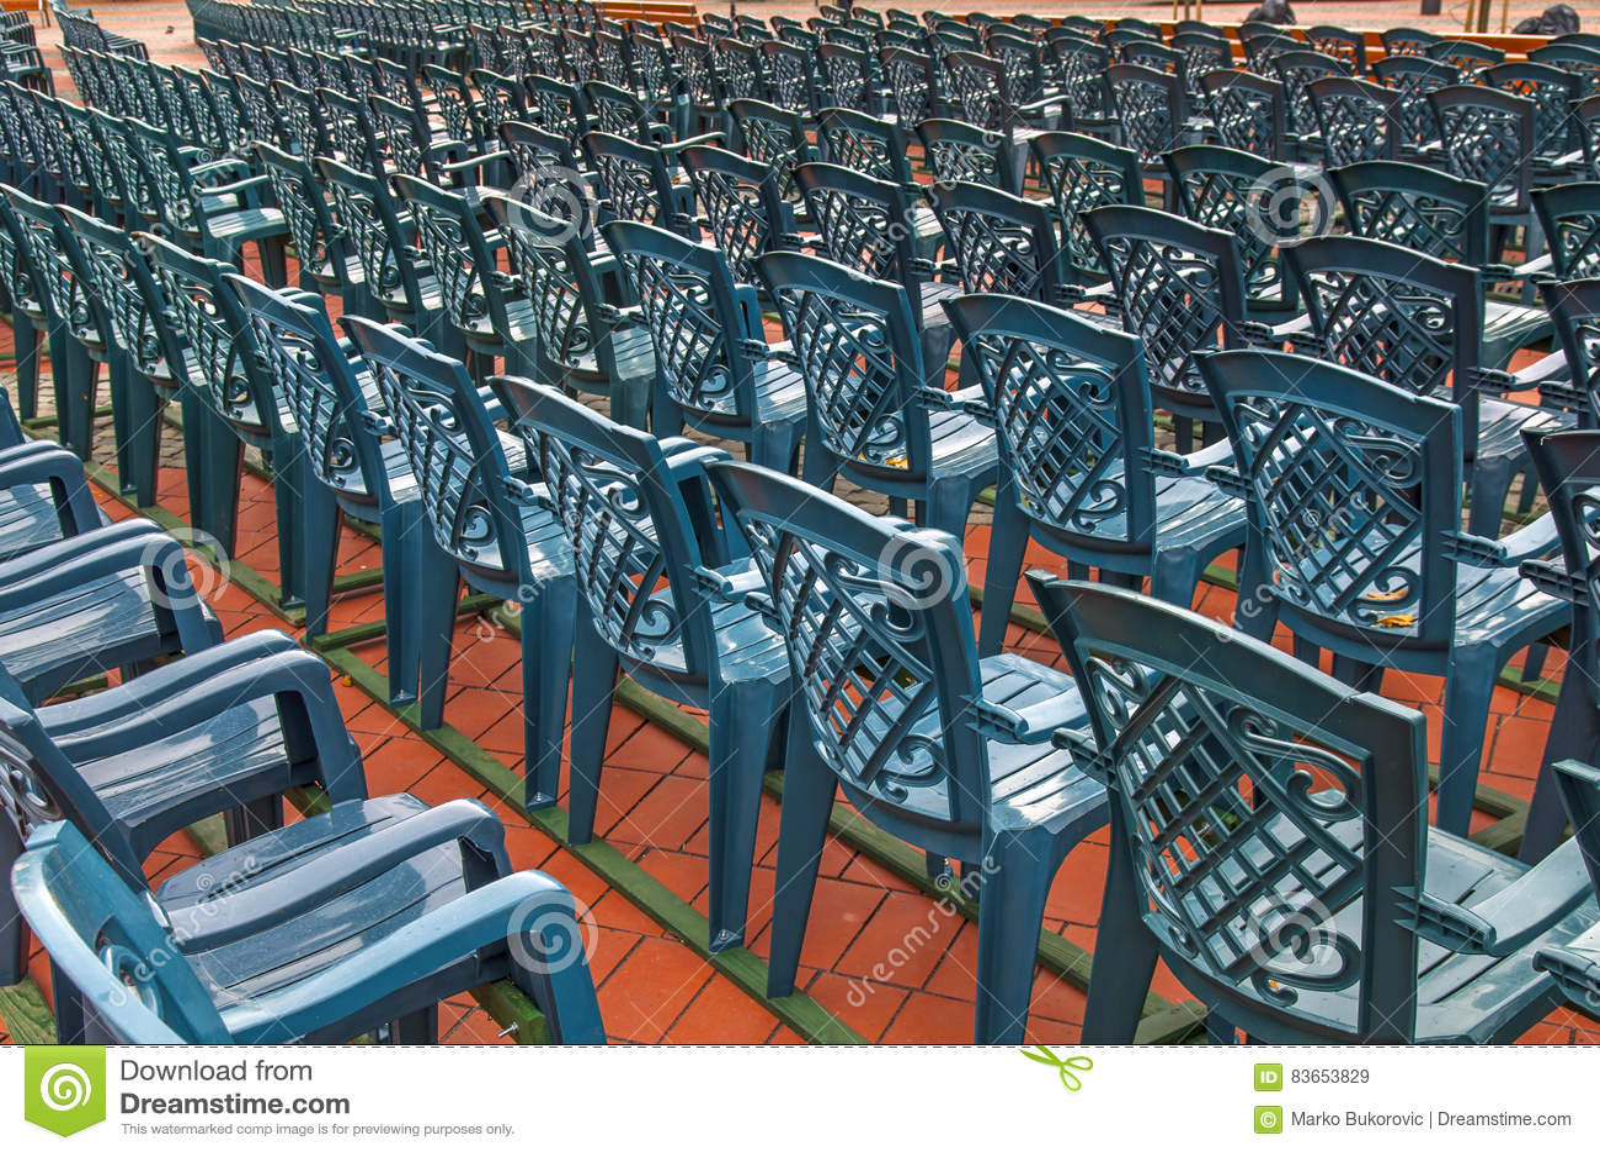 Sedie Verdi Di Plastica.Sedie Da Giardino In Plastica Verdi Sedie In Plastica Per Esterno